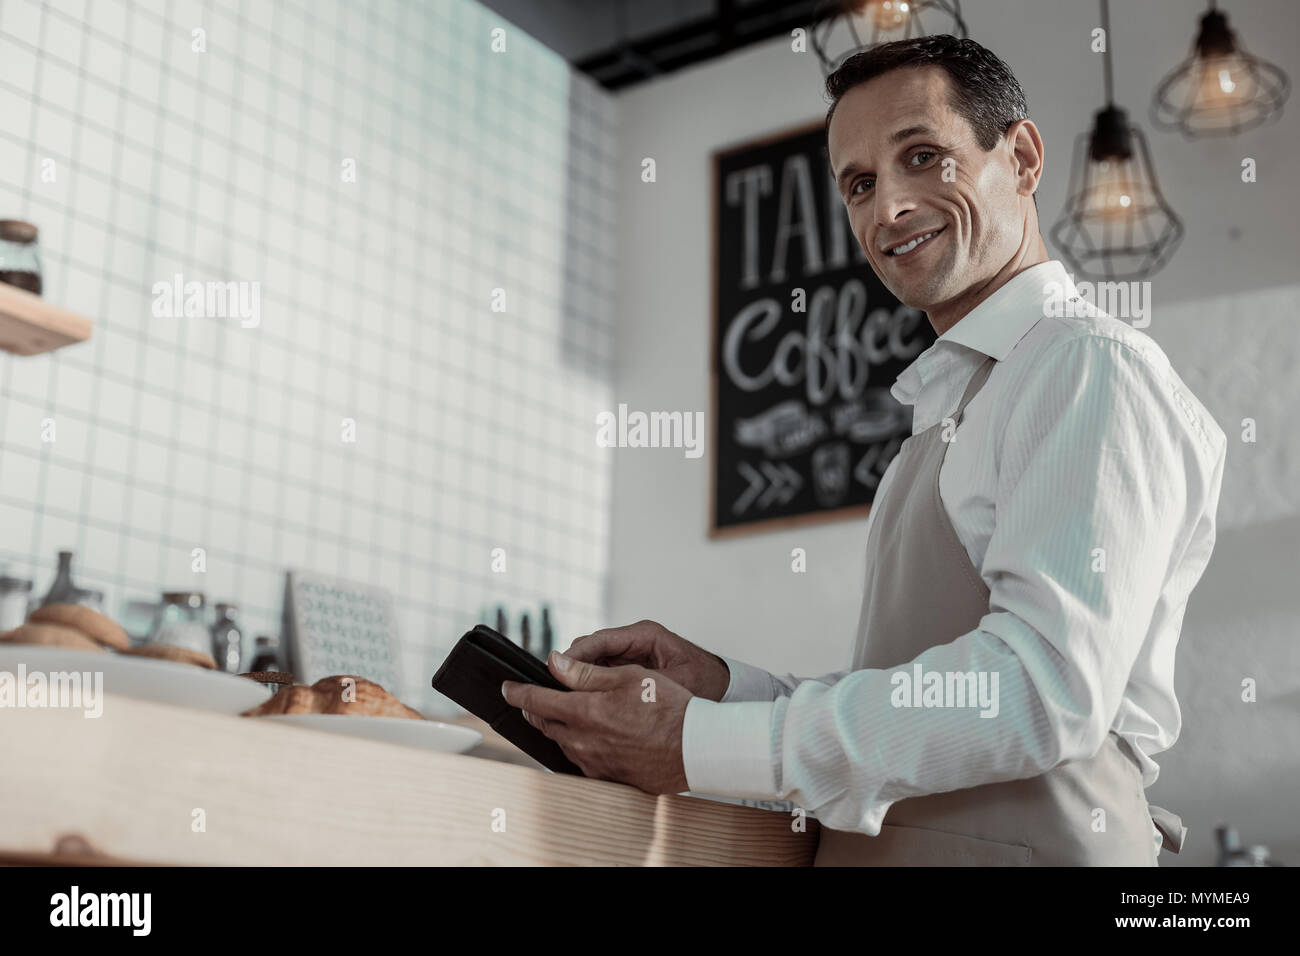 Joyful waiter standing in semi position - Stock Image